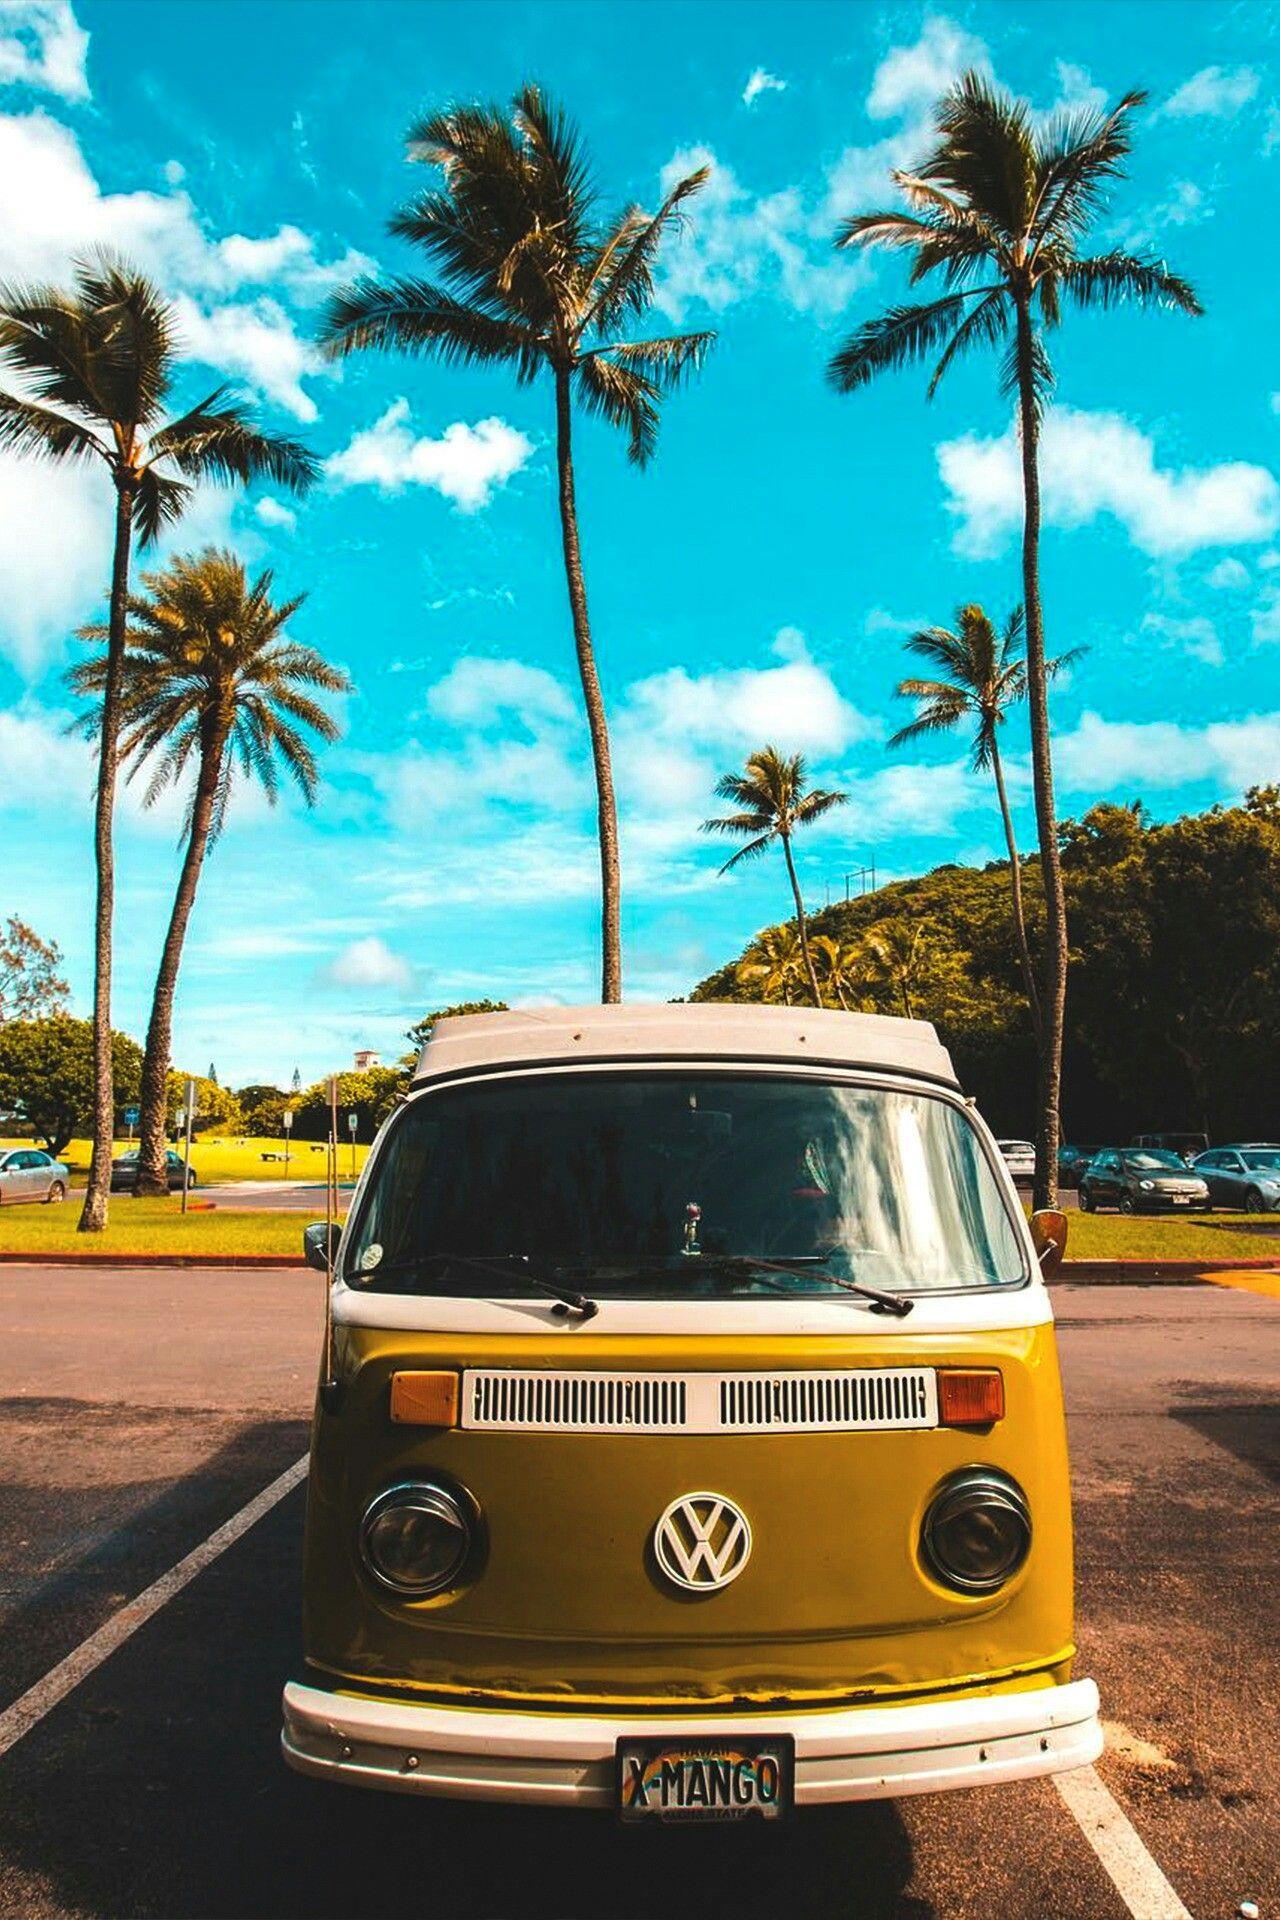 Charm Of Hippie Vw Camper Van Is Irresistible Summer Wallpaper Iphone Background Wallpaper Wallpapers Vintage